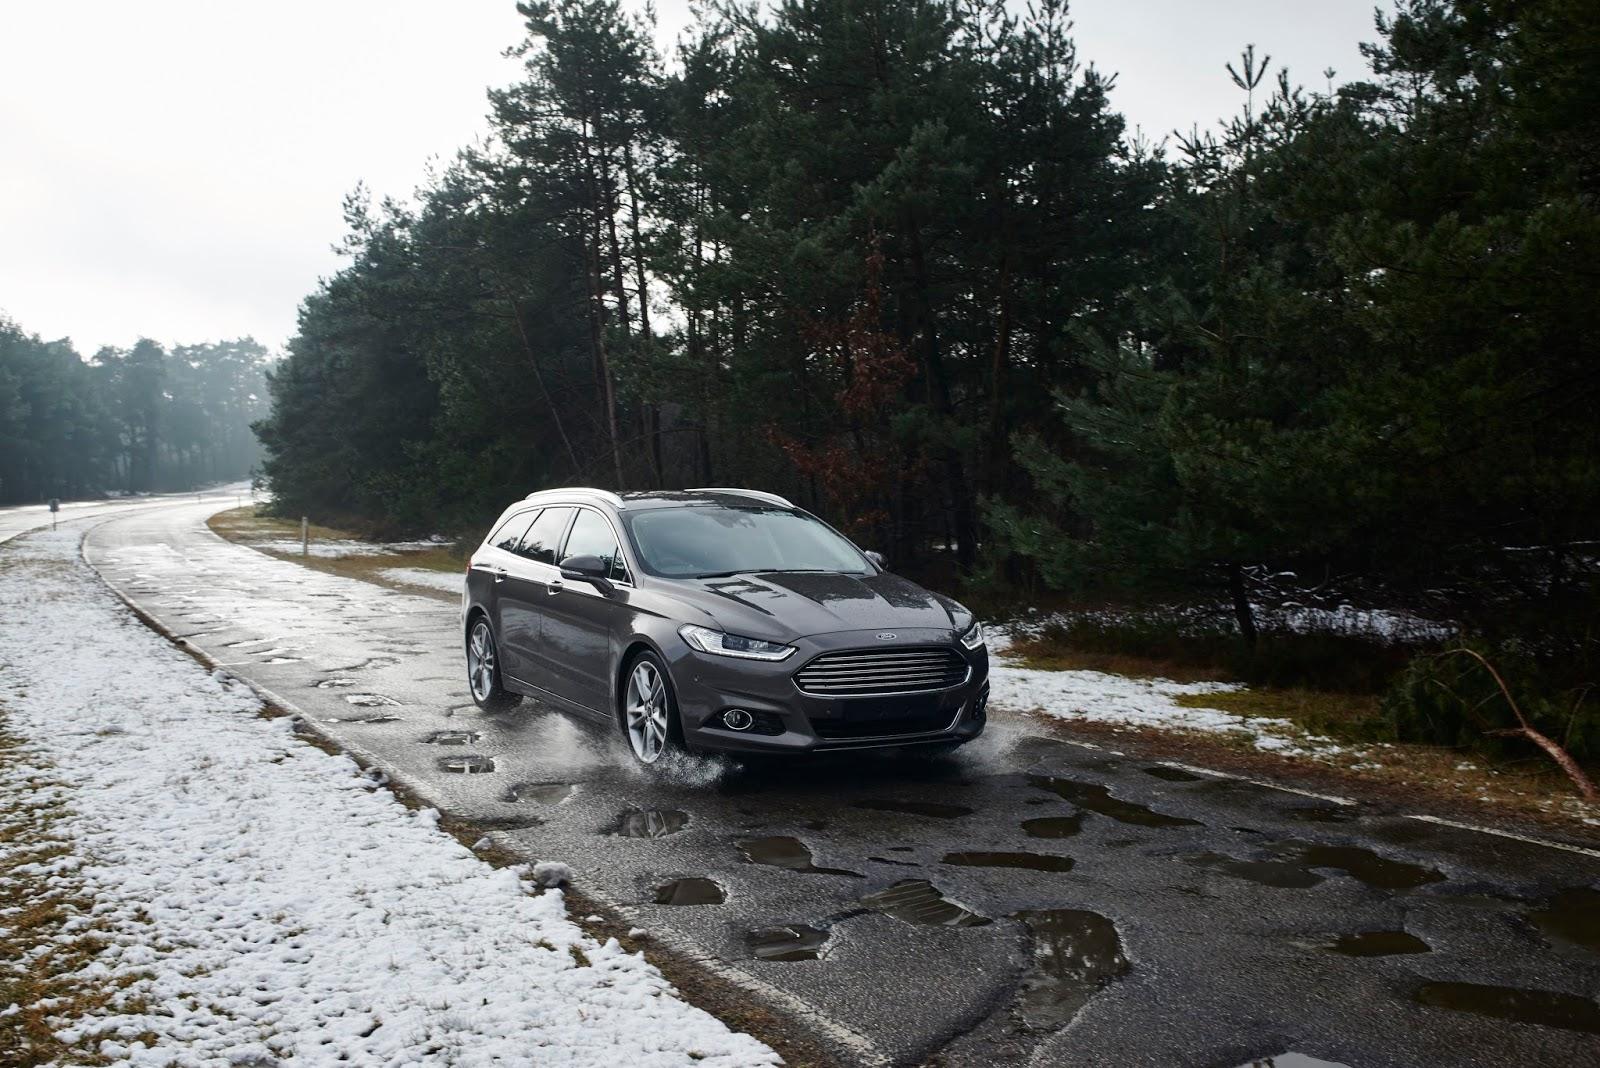 FORD2017 Pothole 1 Η Ford χαρτογραφεί τις λακκούβες Ford, Innovation, τεχνικά, Τεχνολογία